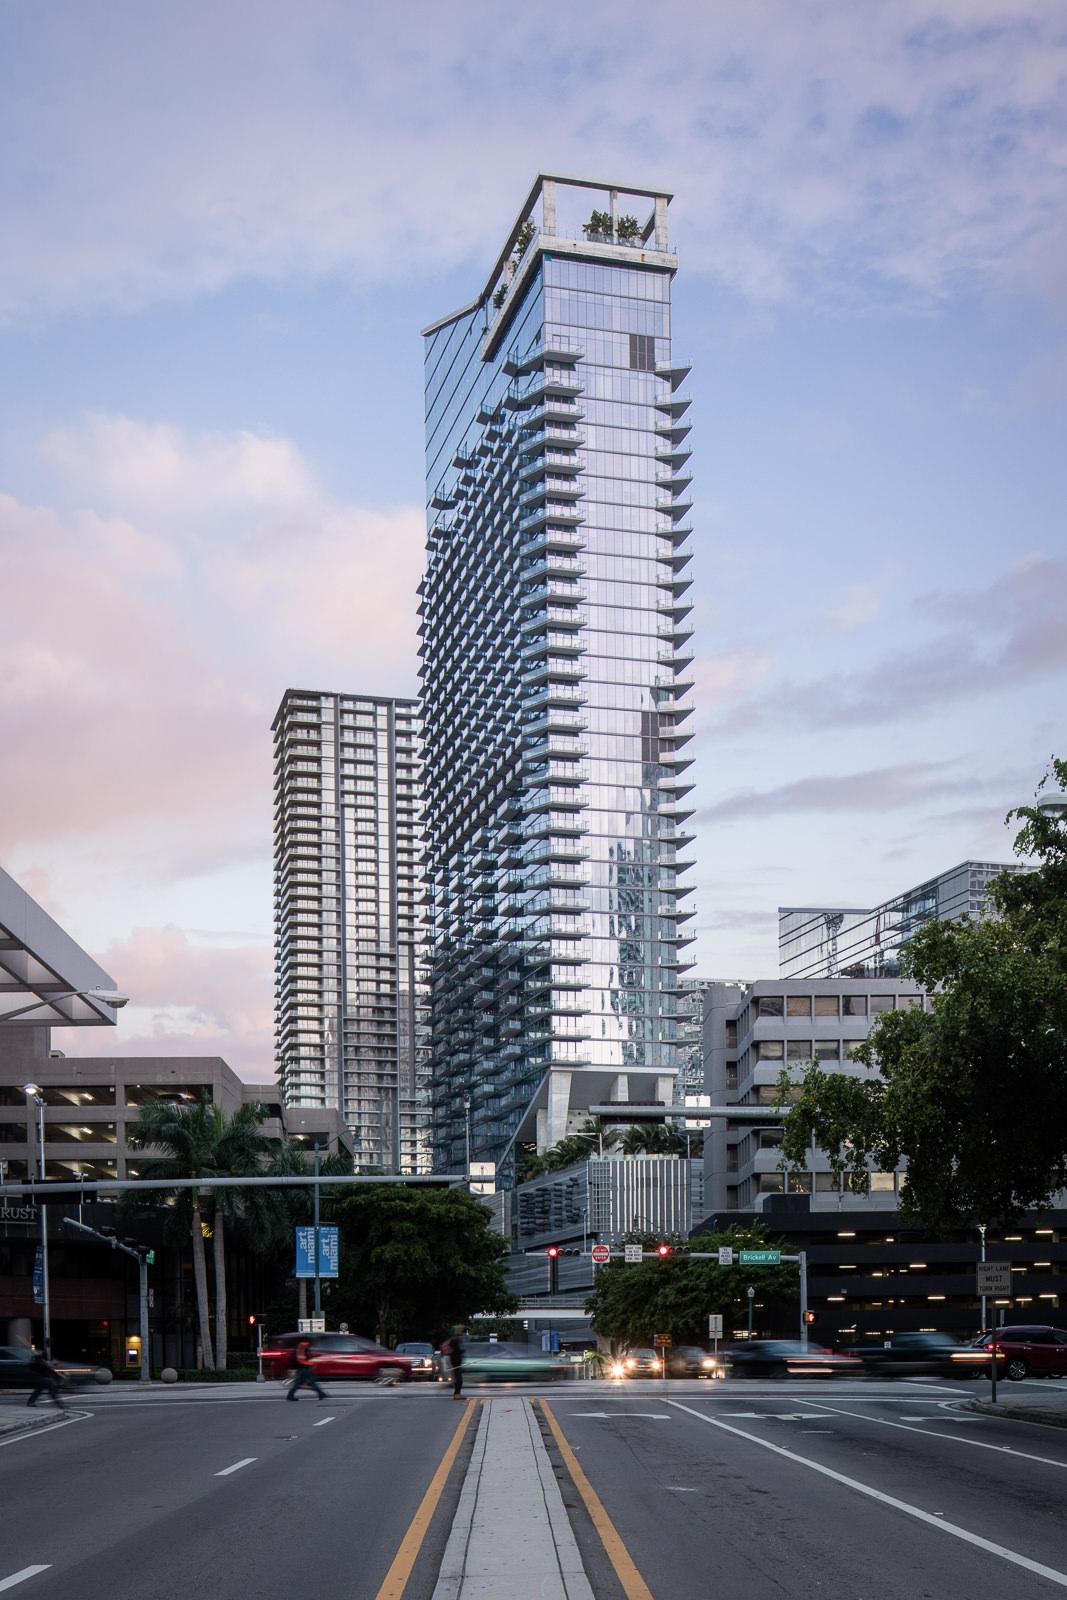 EAST Hotel, Miami, FL - Swire Group